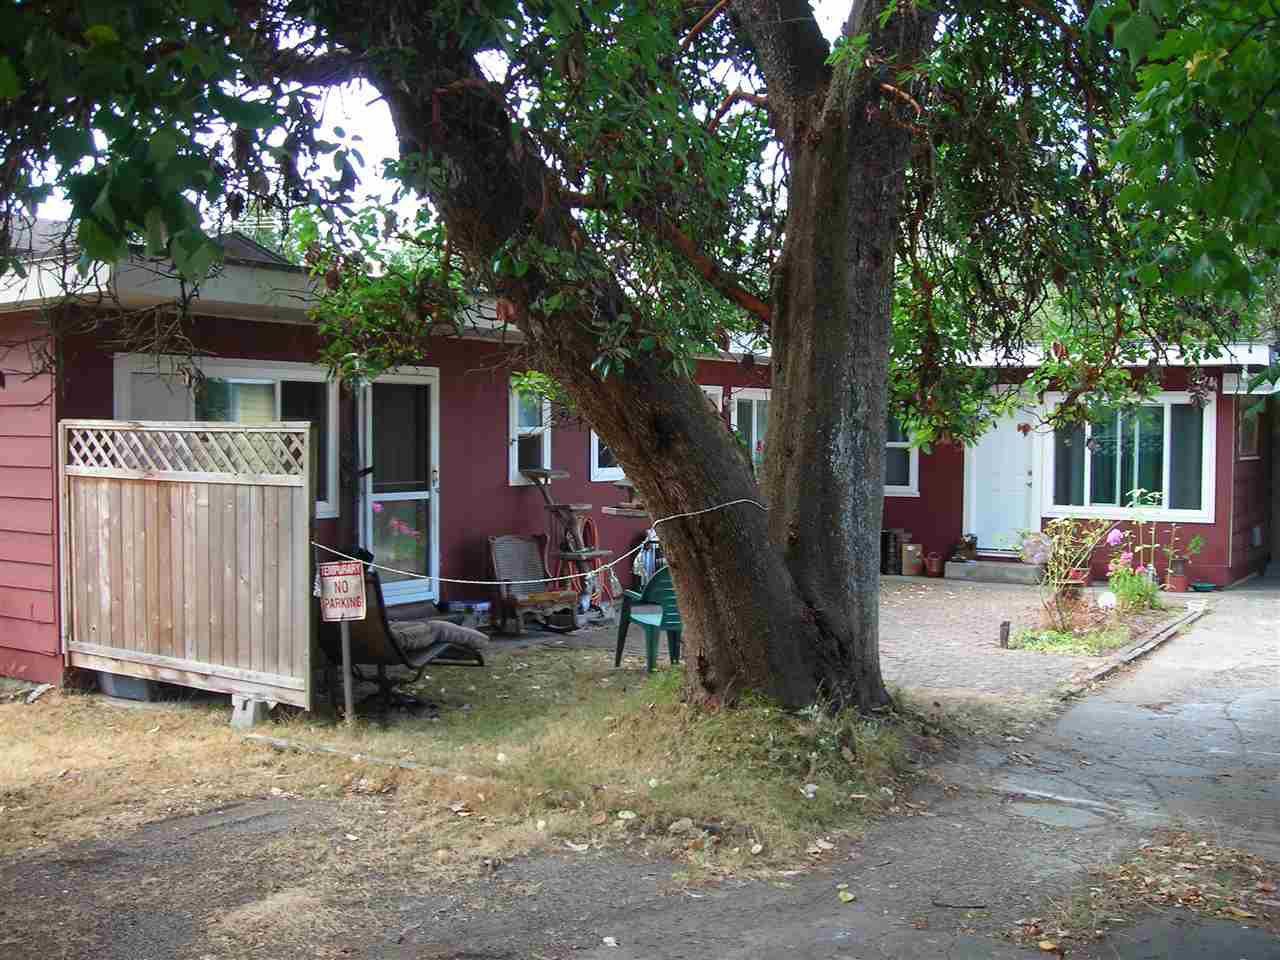 Main Photo: 5675 WHARF Avenue in Sechelt: Sechelt District Home for sale (Sunshine Coast)  : MLS®# R2294412